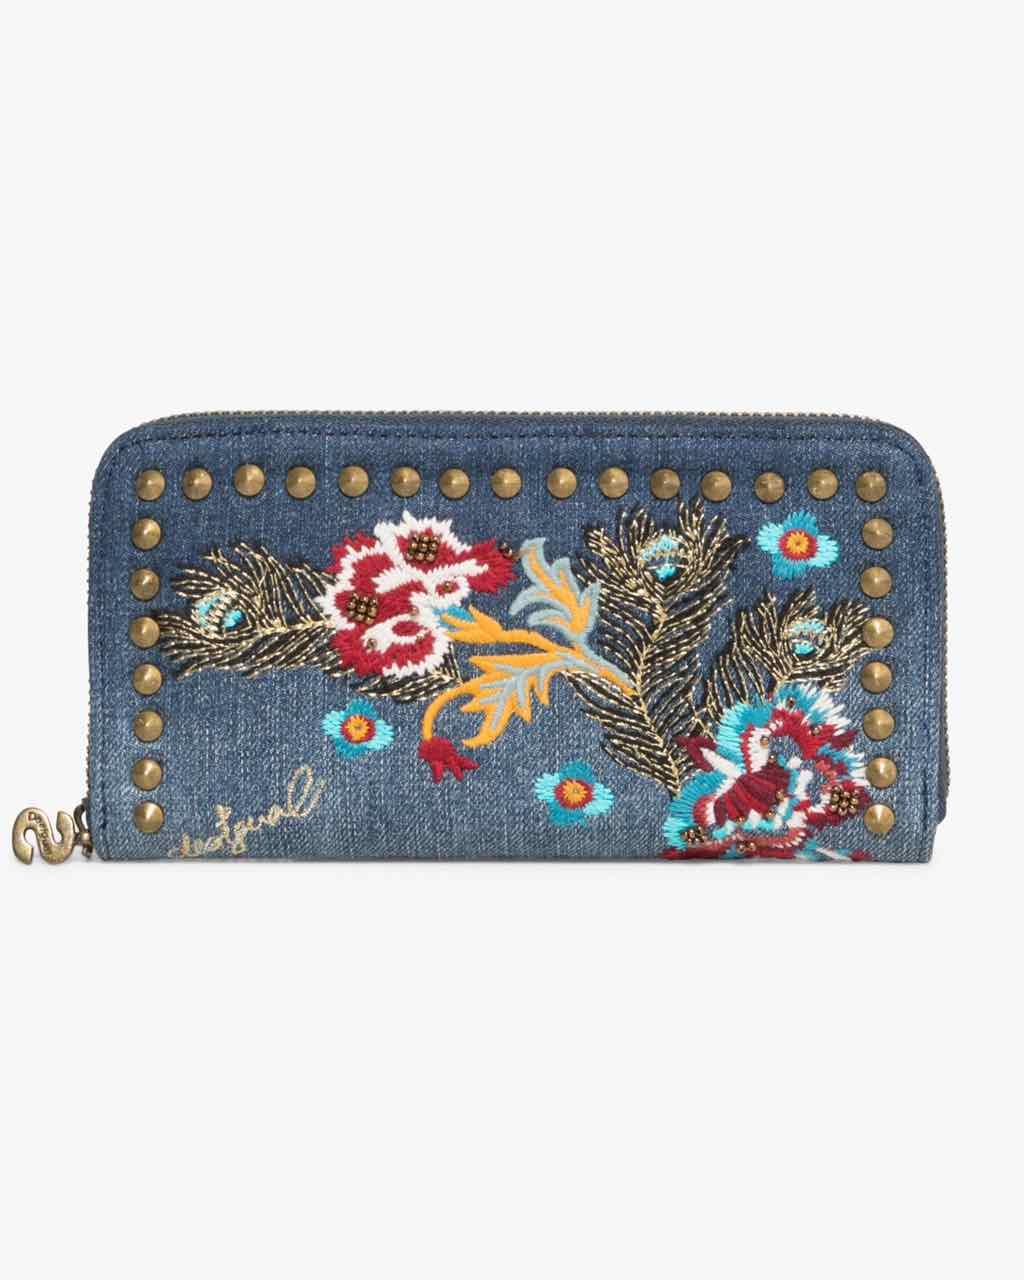 17WAYDDN_5006 Desigual Wallet Fiona Jade Buy Online